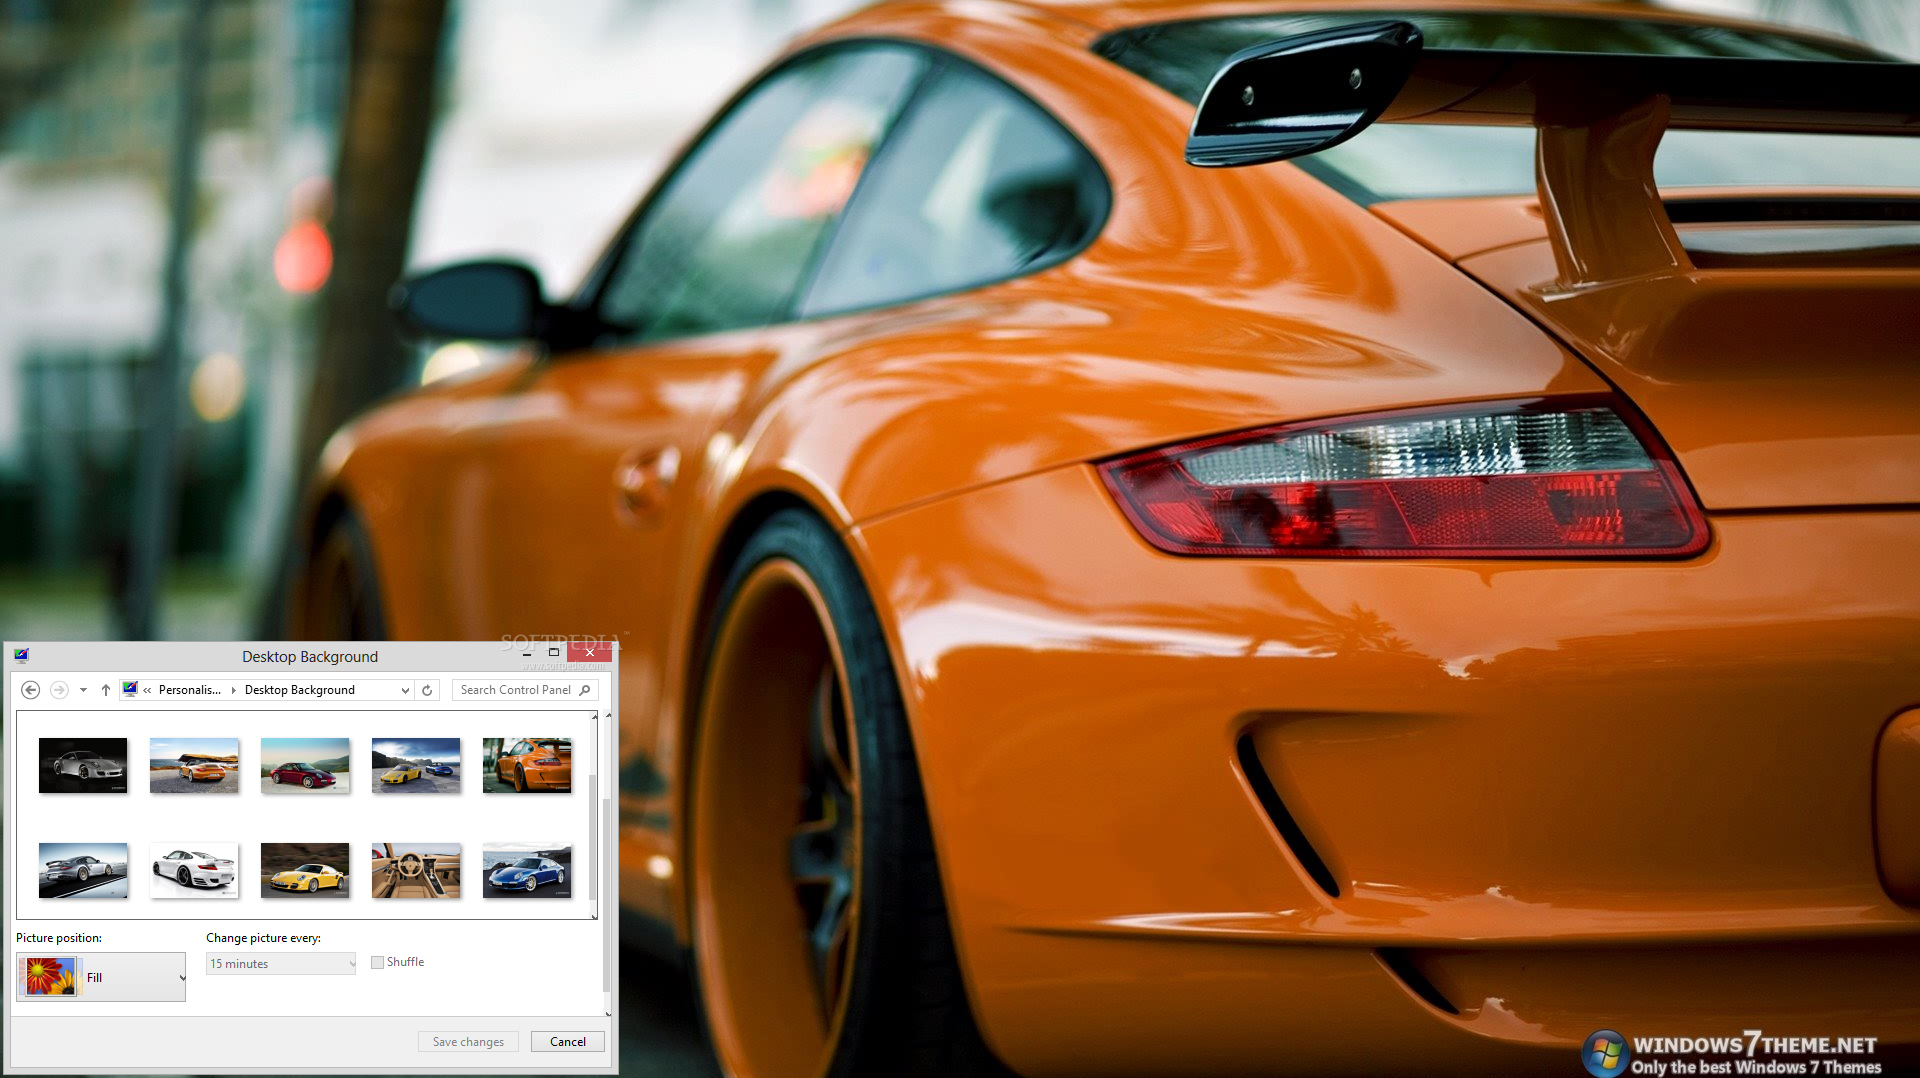 Porsche 911 Windows 7 Theme Will Provide Fans And